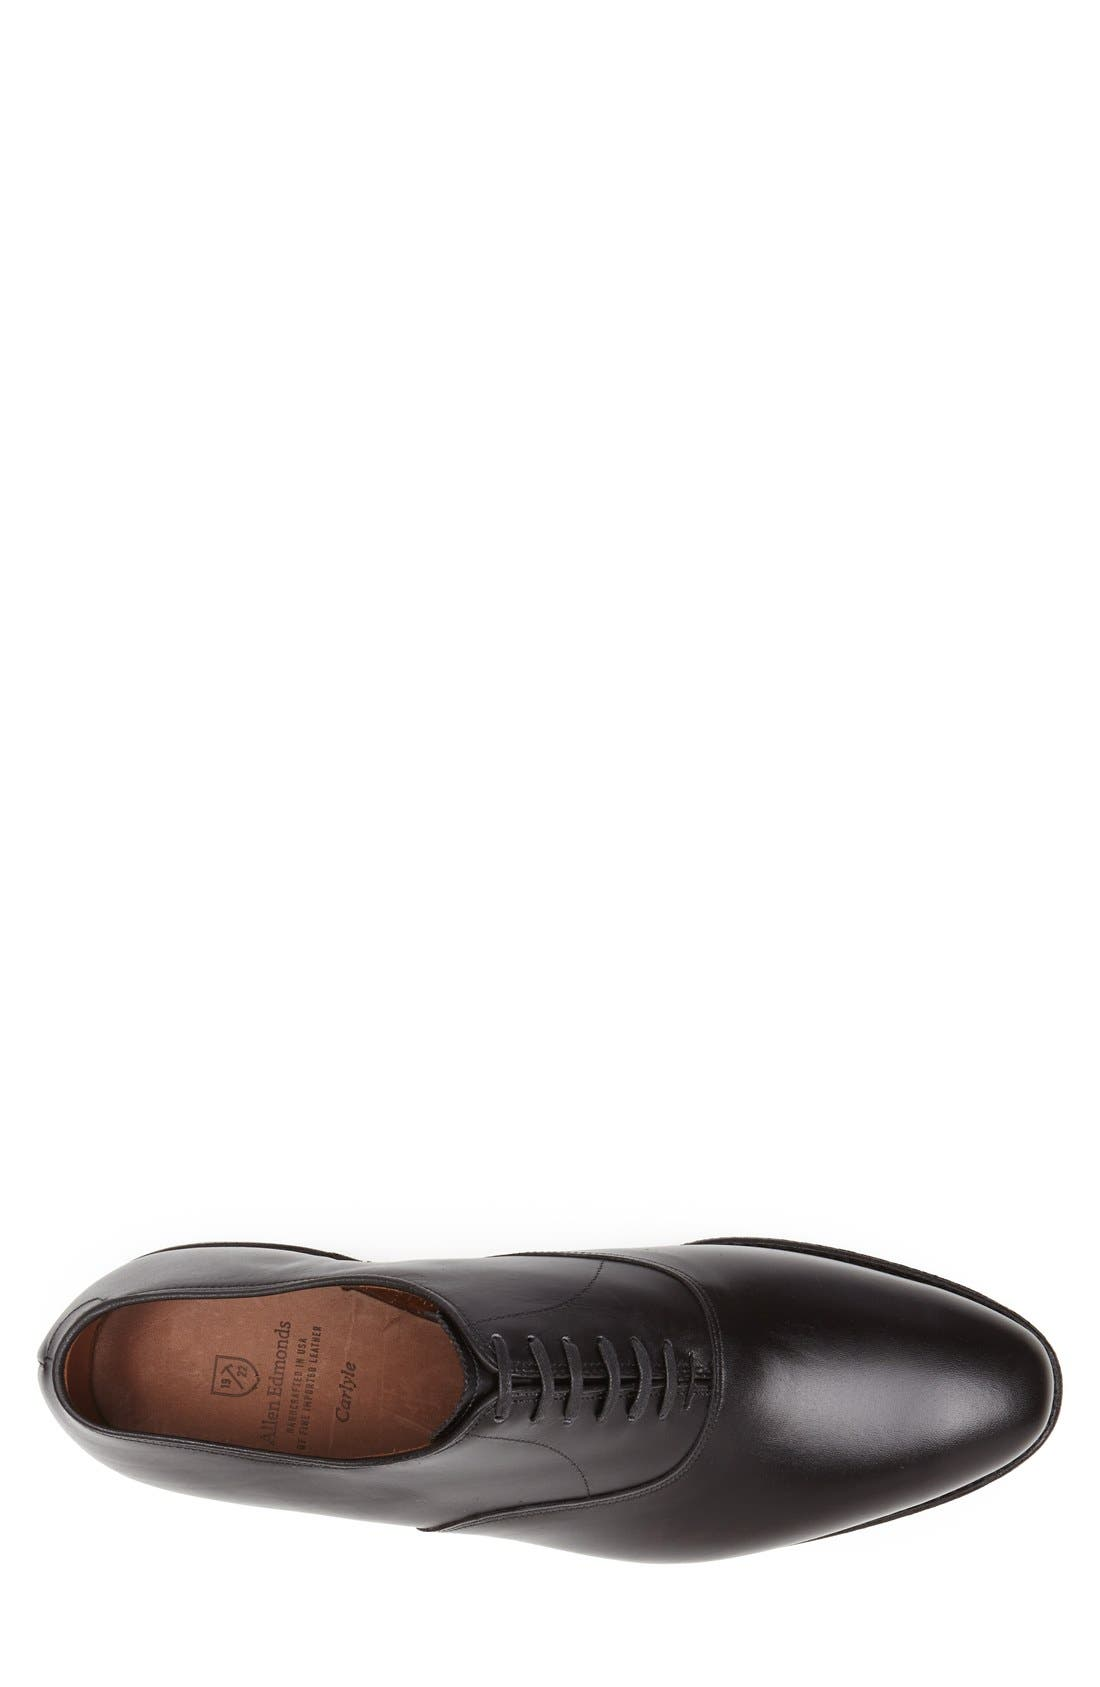 Carlyle Plain Toe Oxford,                             Alternate thumbnail 3, color,                             Black Leather